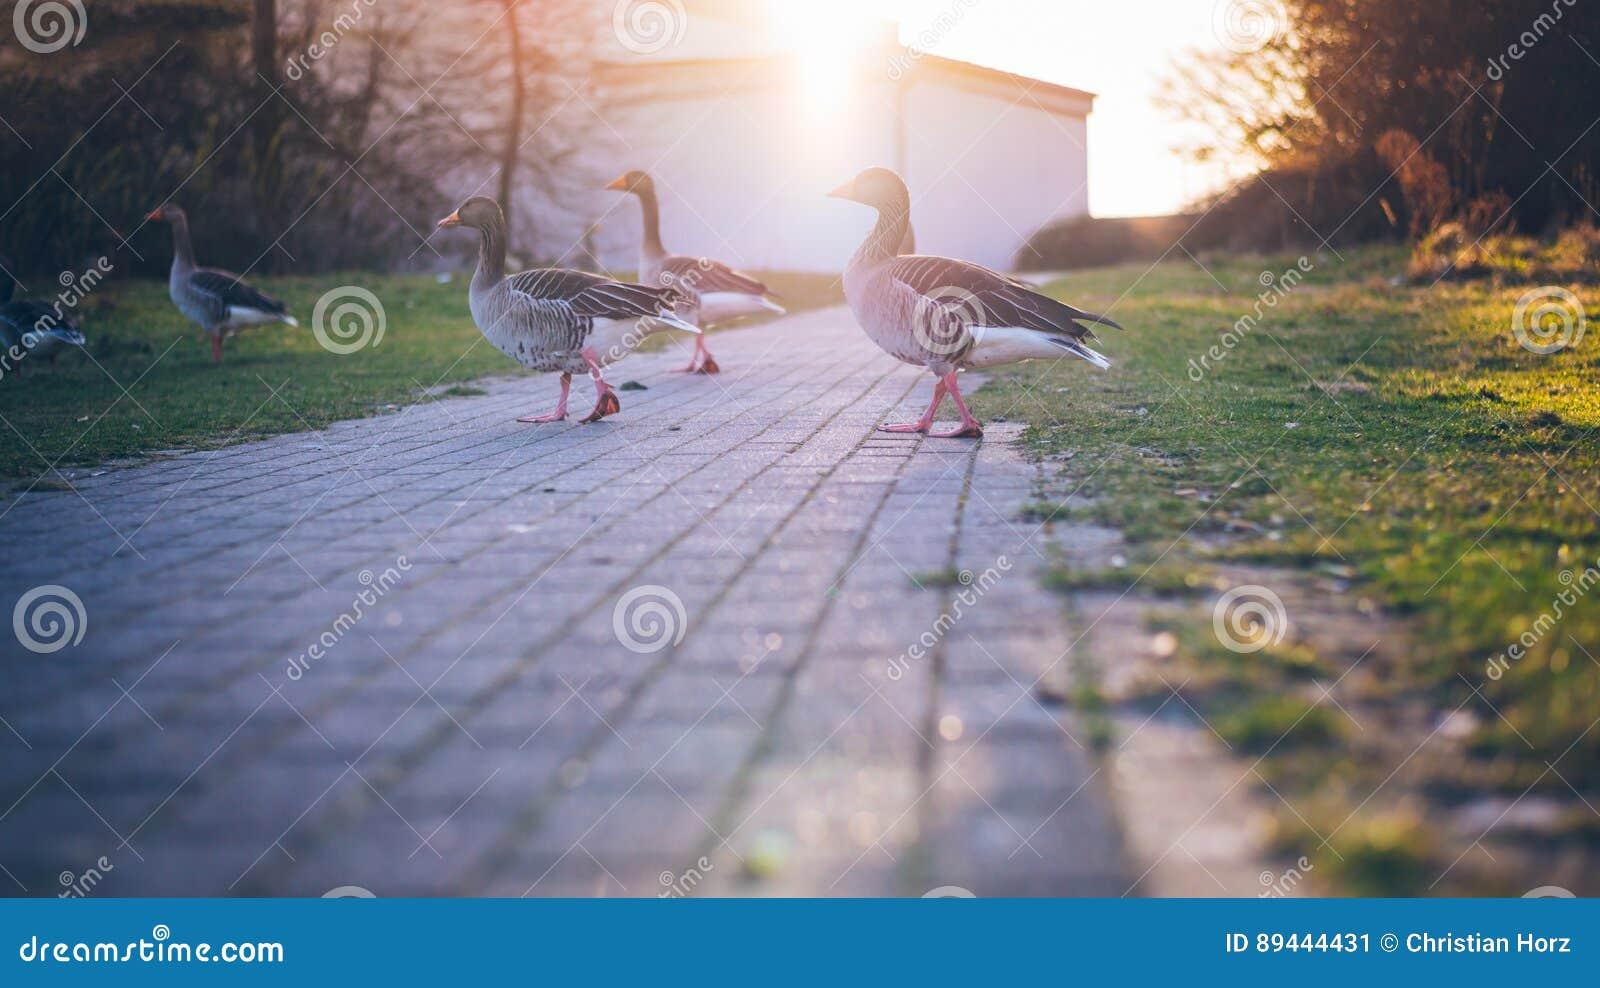 Walking geese